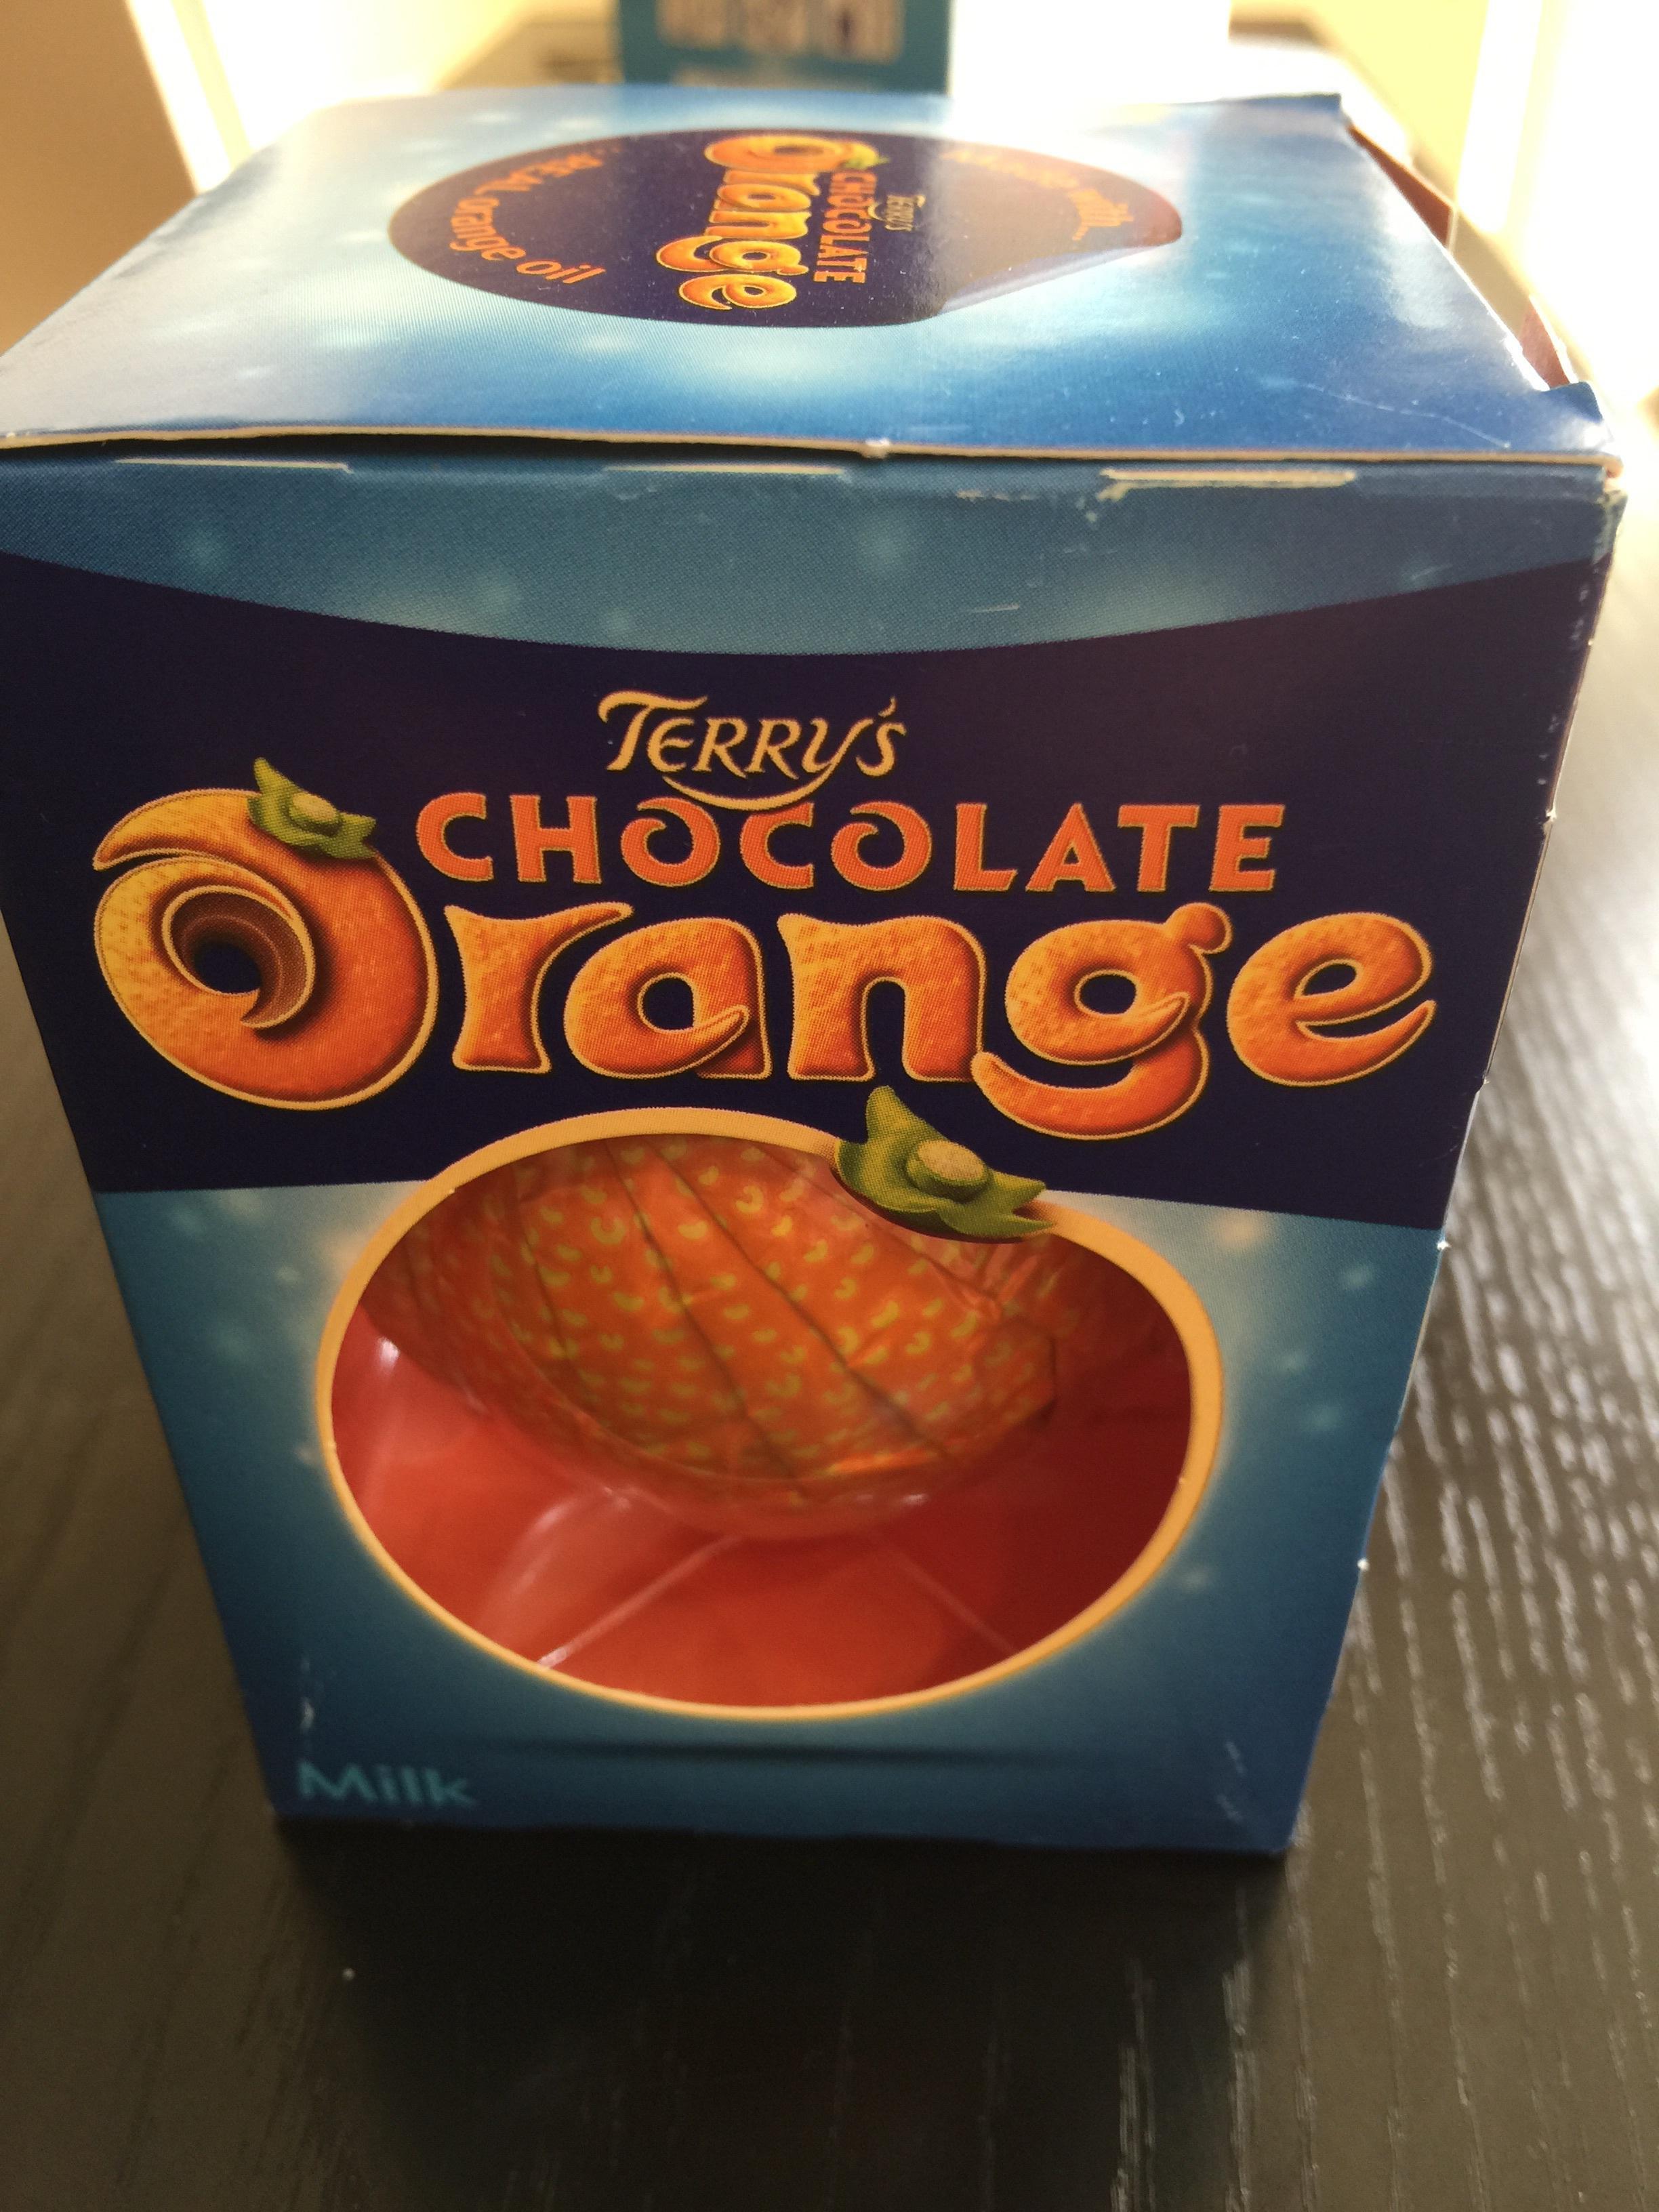 Chocolate orange, unopened